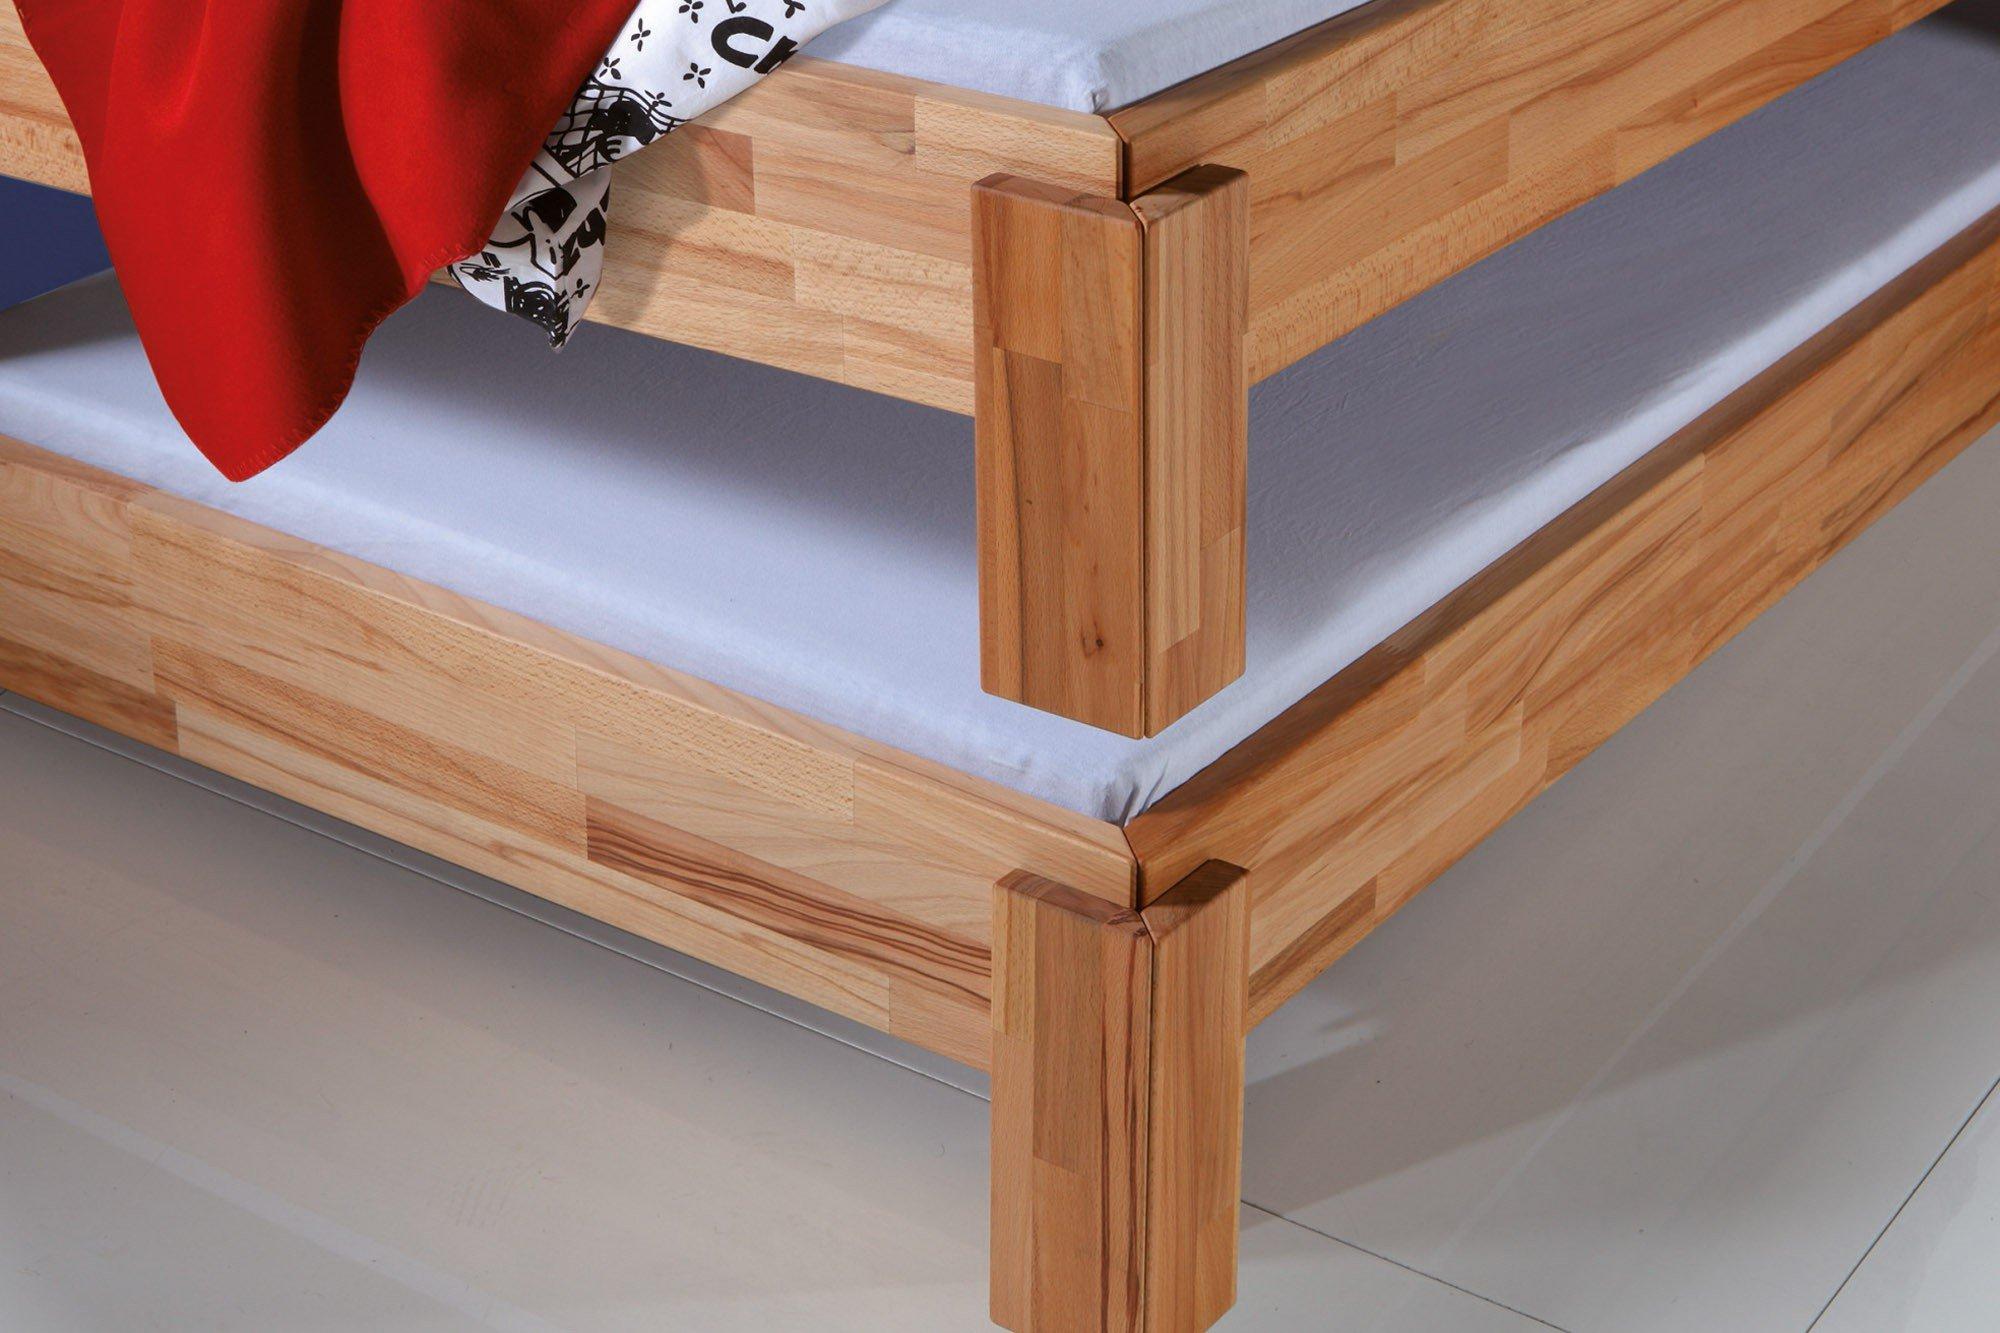 hasena function comfort amigo kernbuche m bel letz ihr online shop. Black Bedroom Furniture Sets. Home Design Ideas